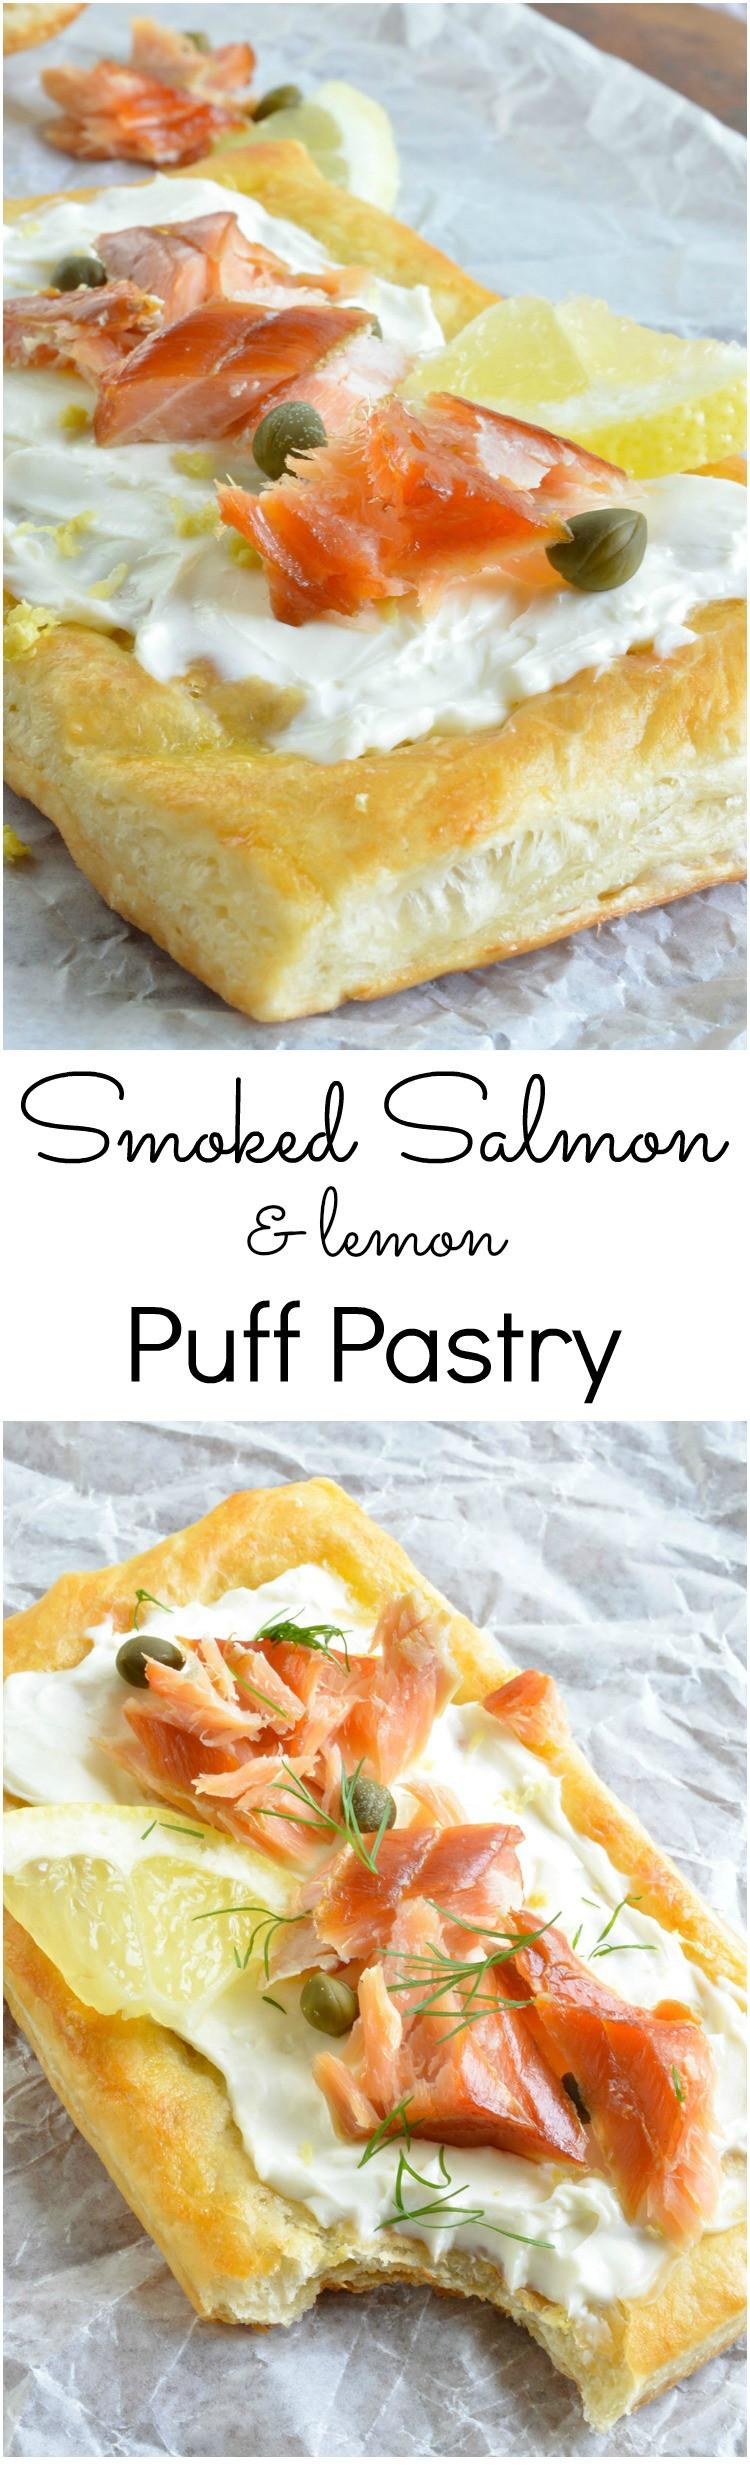 Smoked Salmon Recipes Appetizers  Easy Smoked Salmon Appetizer Recipe WonkyWonderful